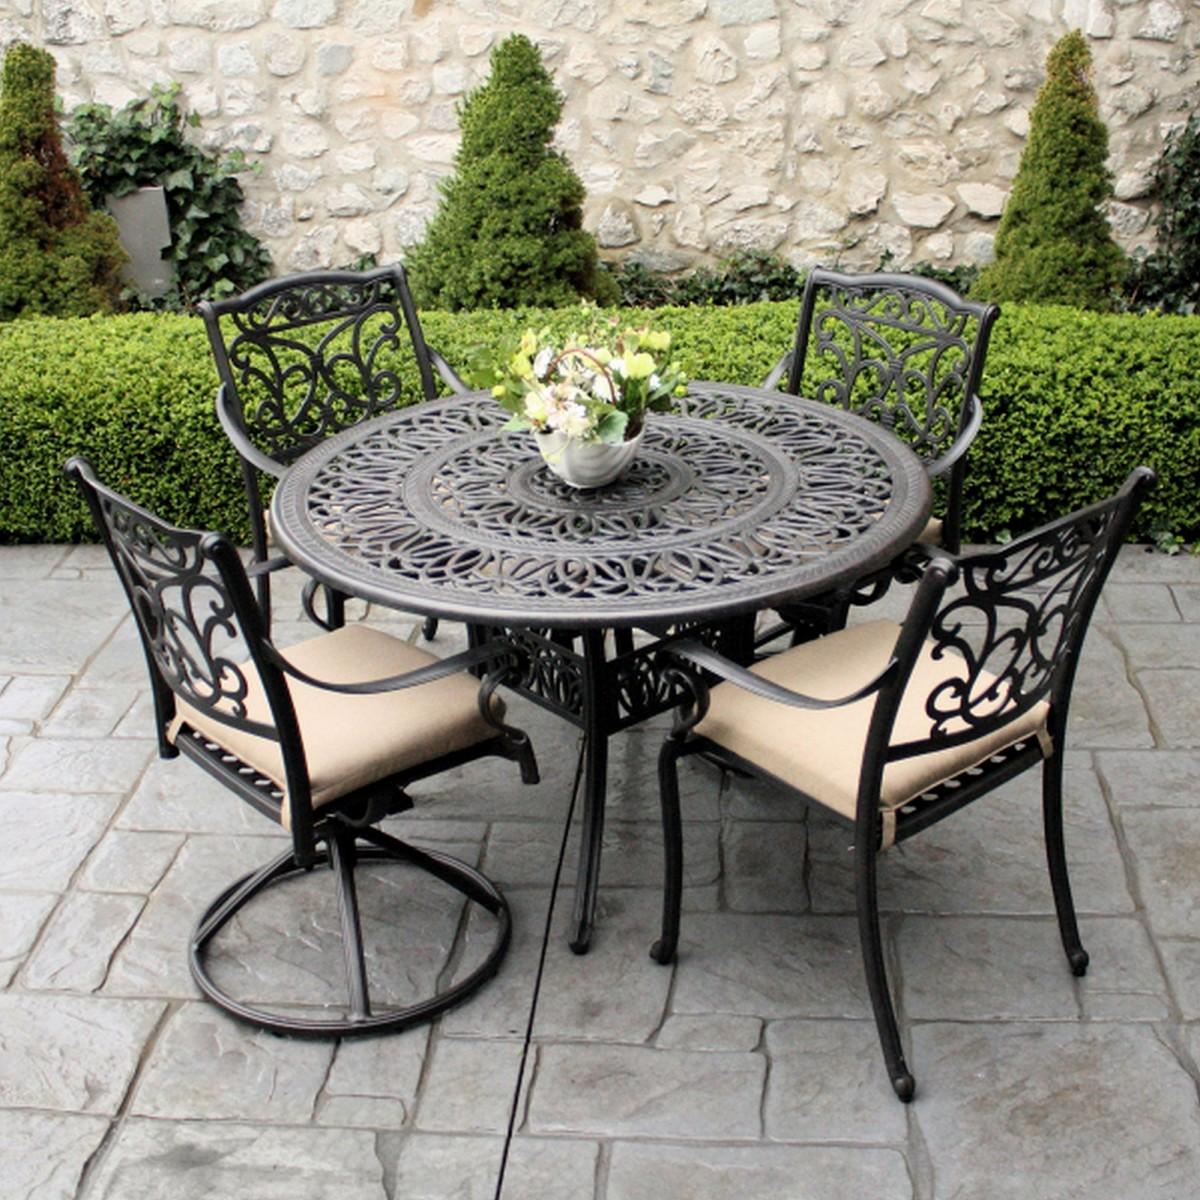 wrought iron patio furniture gorgeous rod iron patio furniture exterior design images wrought iron patio YZBWHPZ